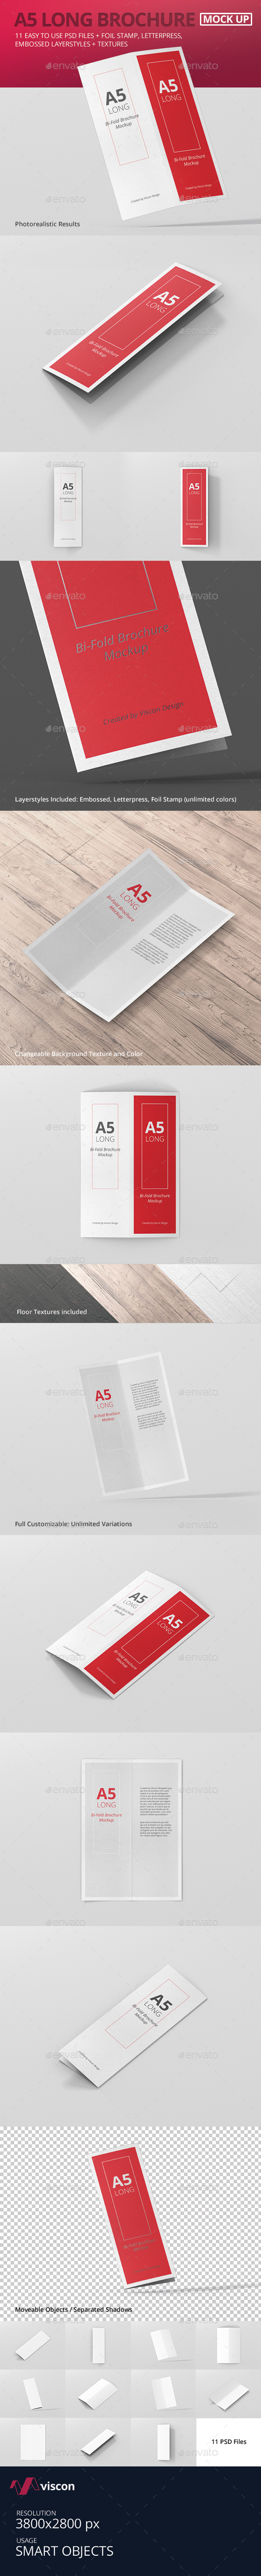 A5 Long Bi-Fold Brochure Mock-Up - Brochures Print